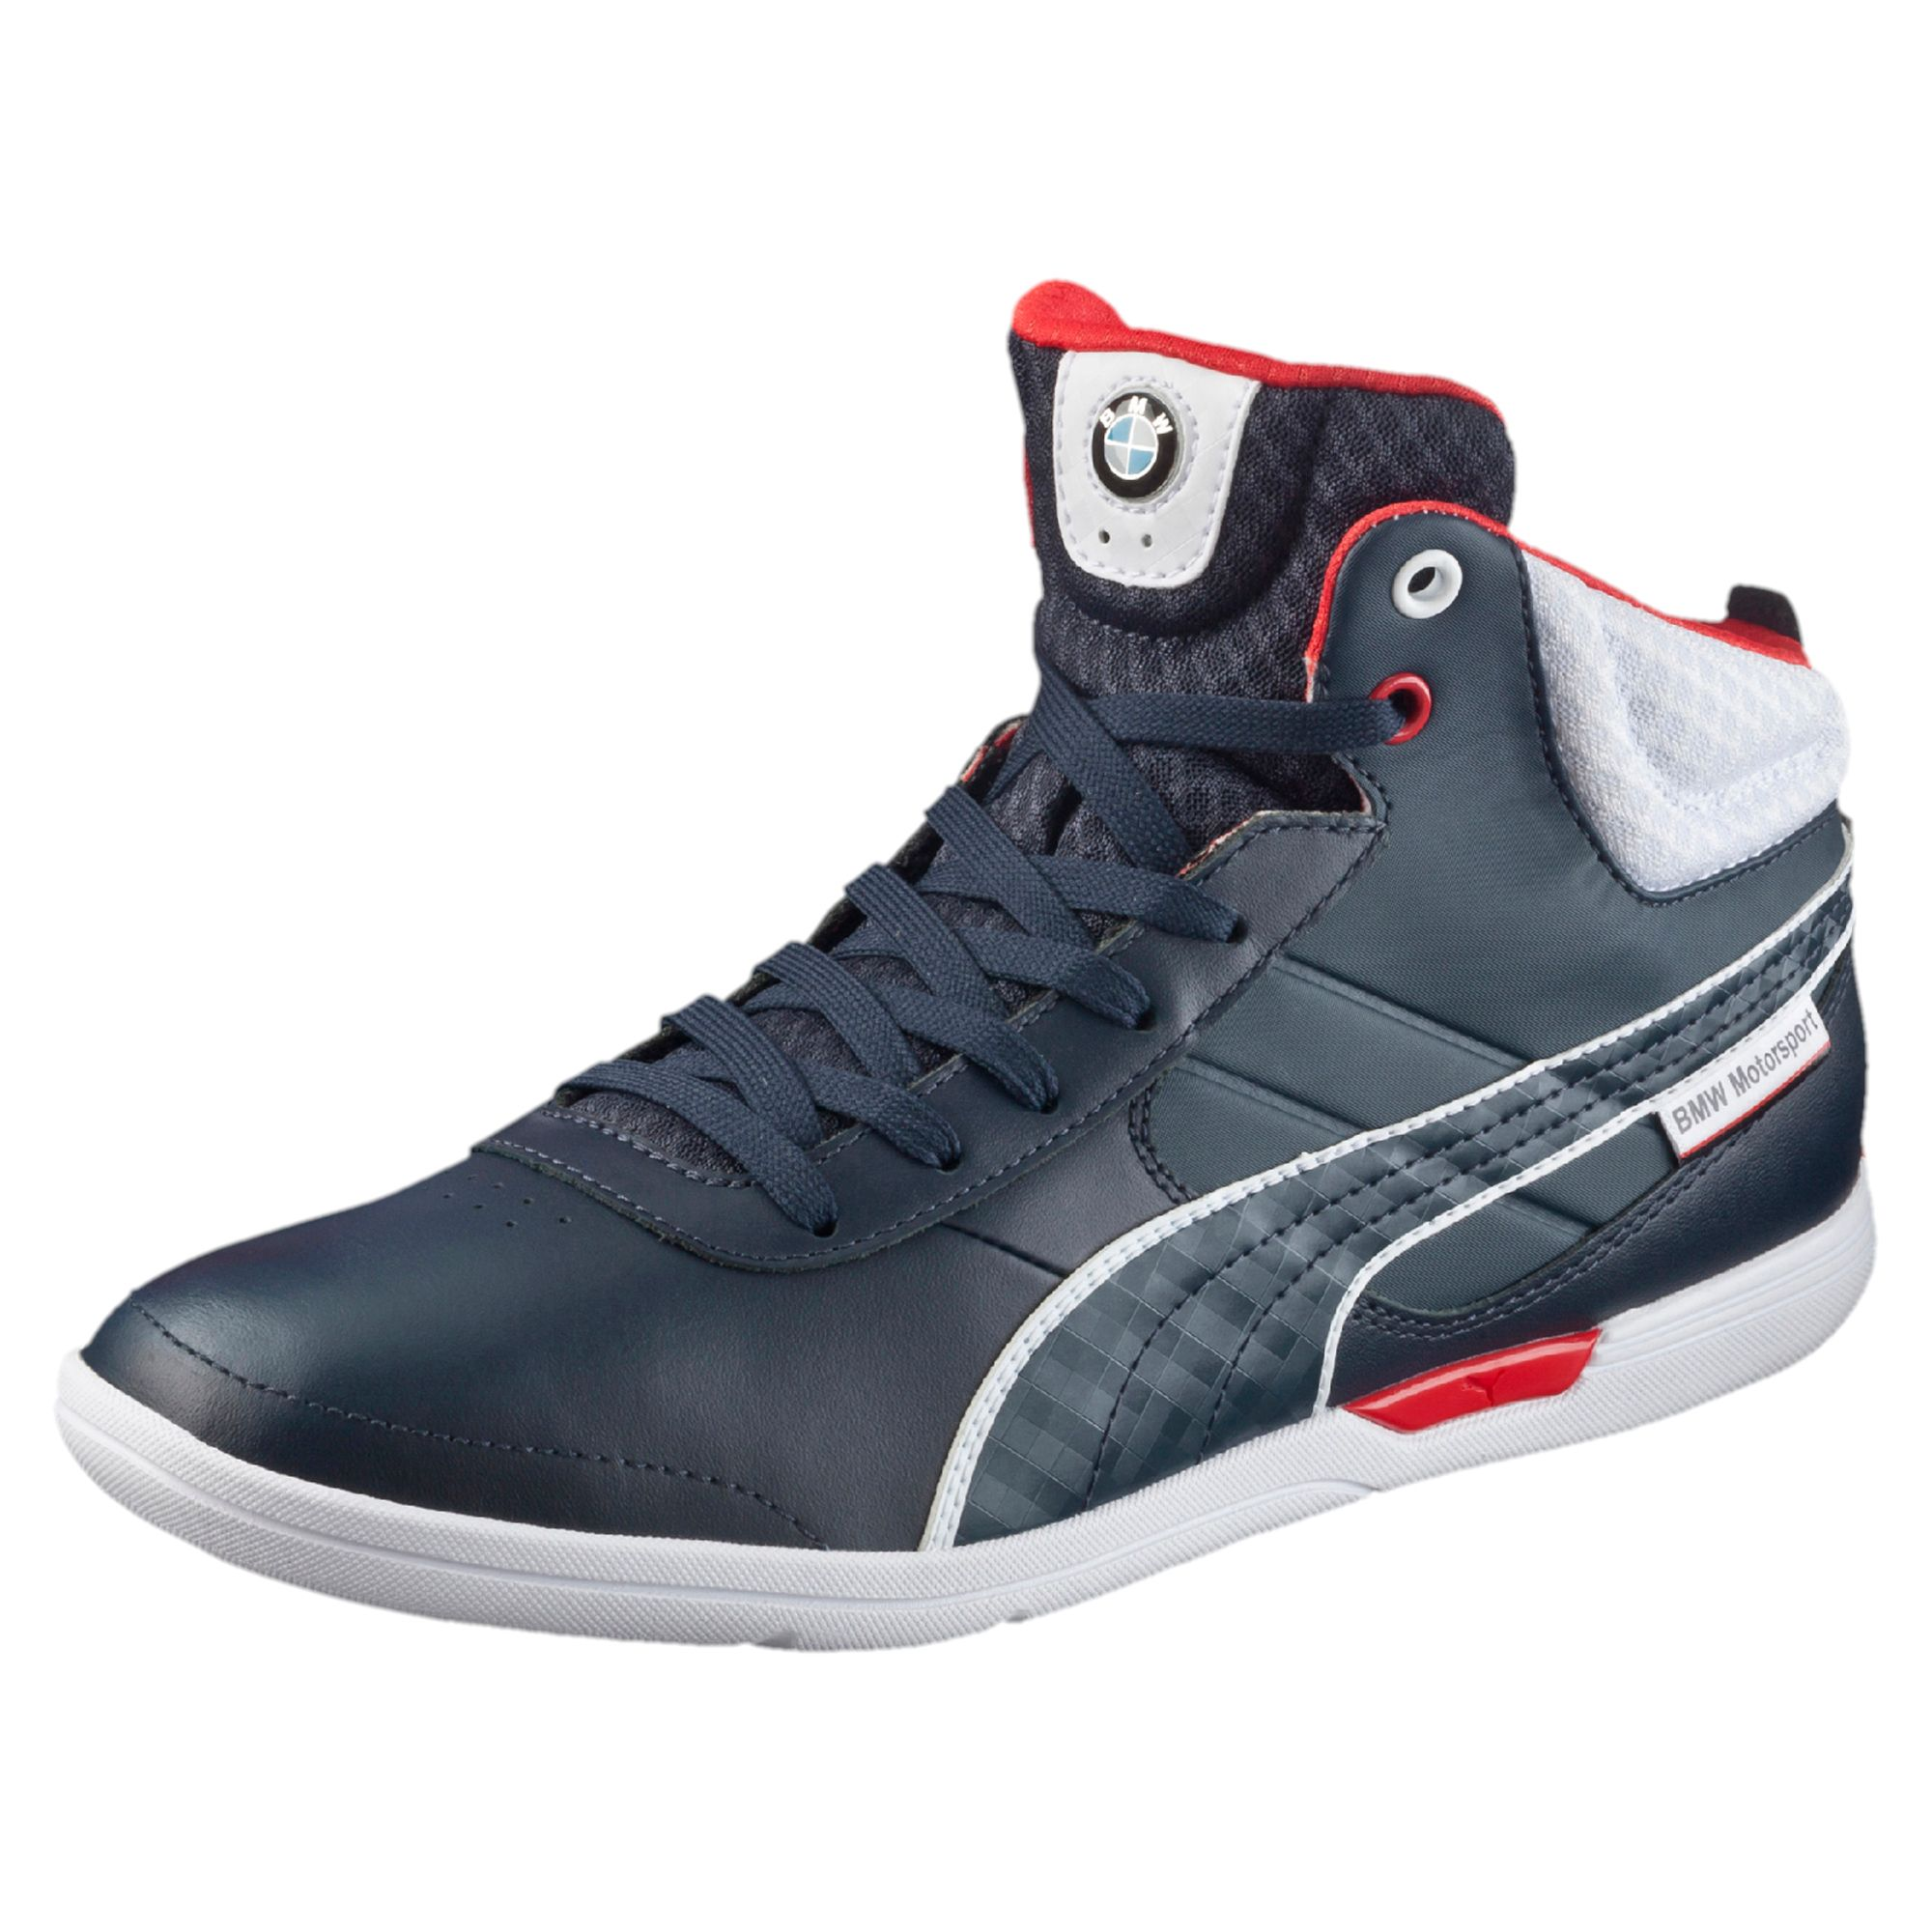 Puma Bmw Shoes High Tops